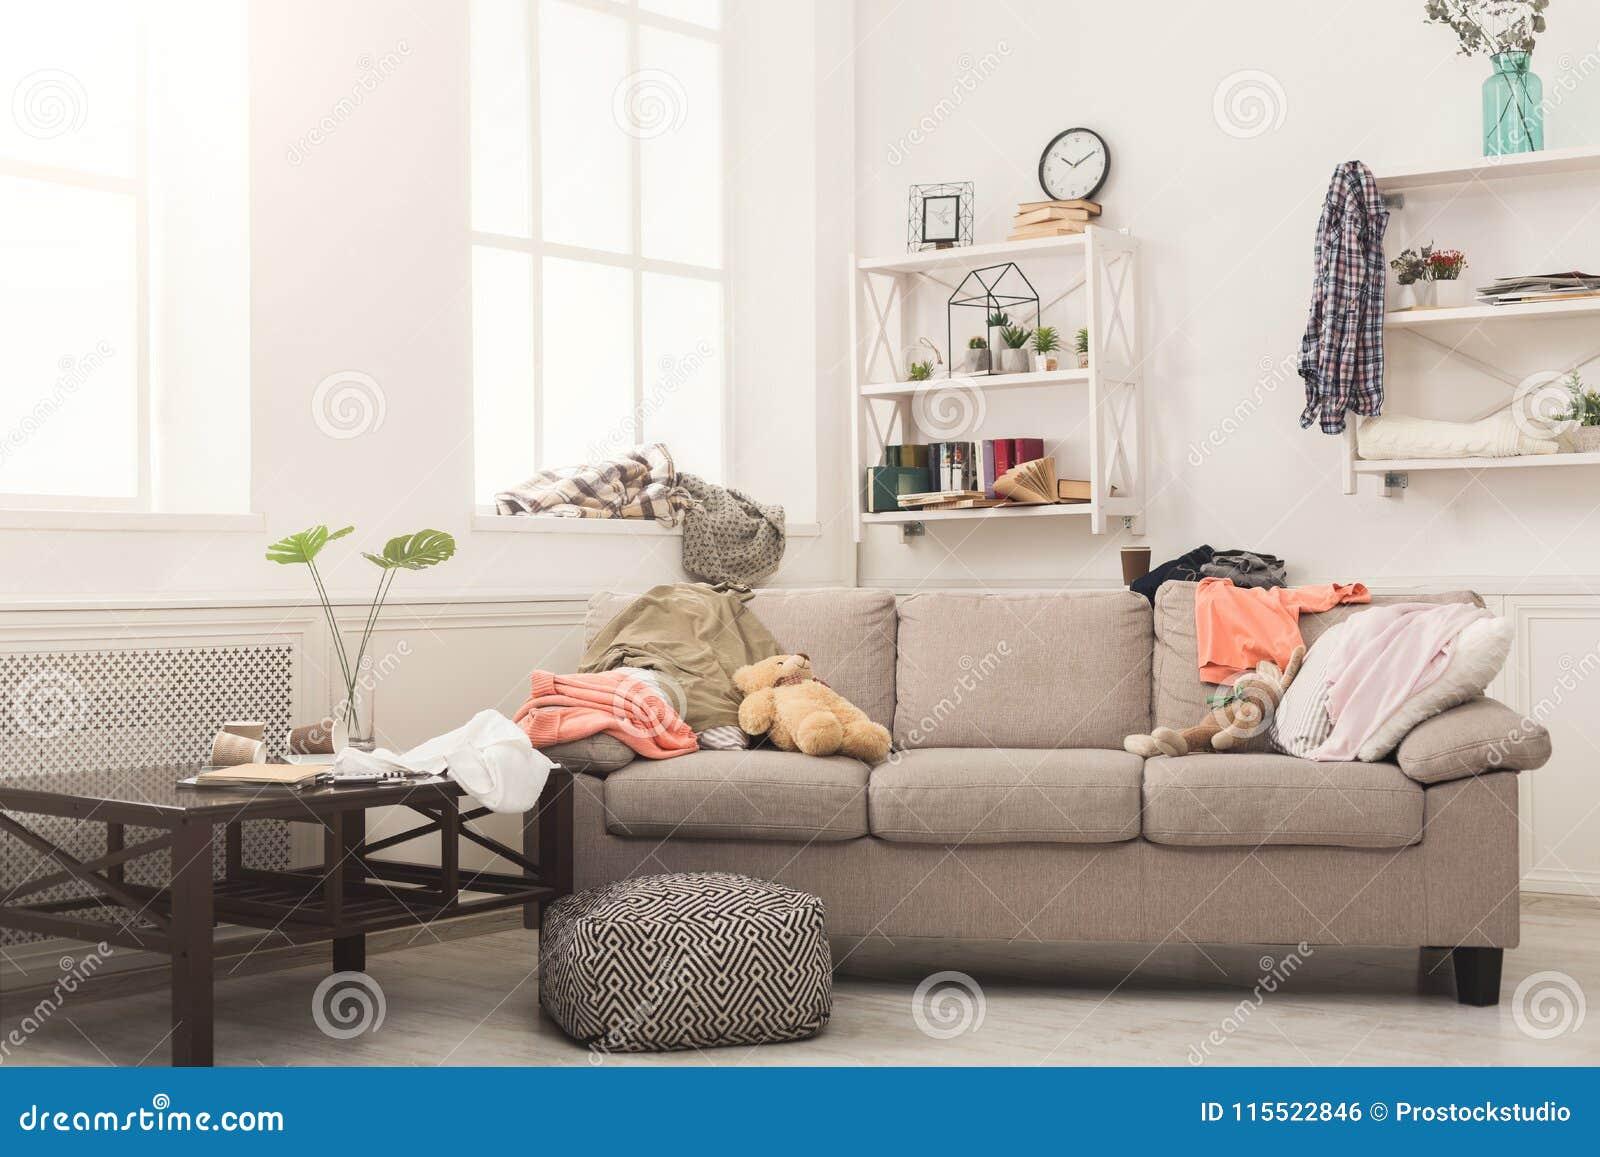 Soffa i smutsigt rum